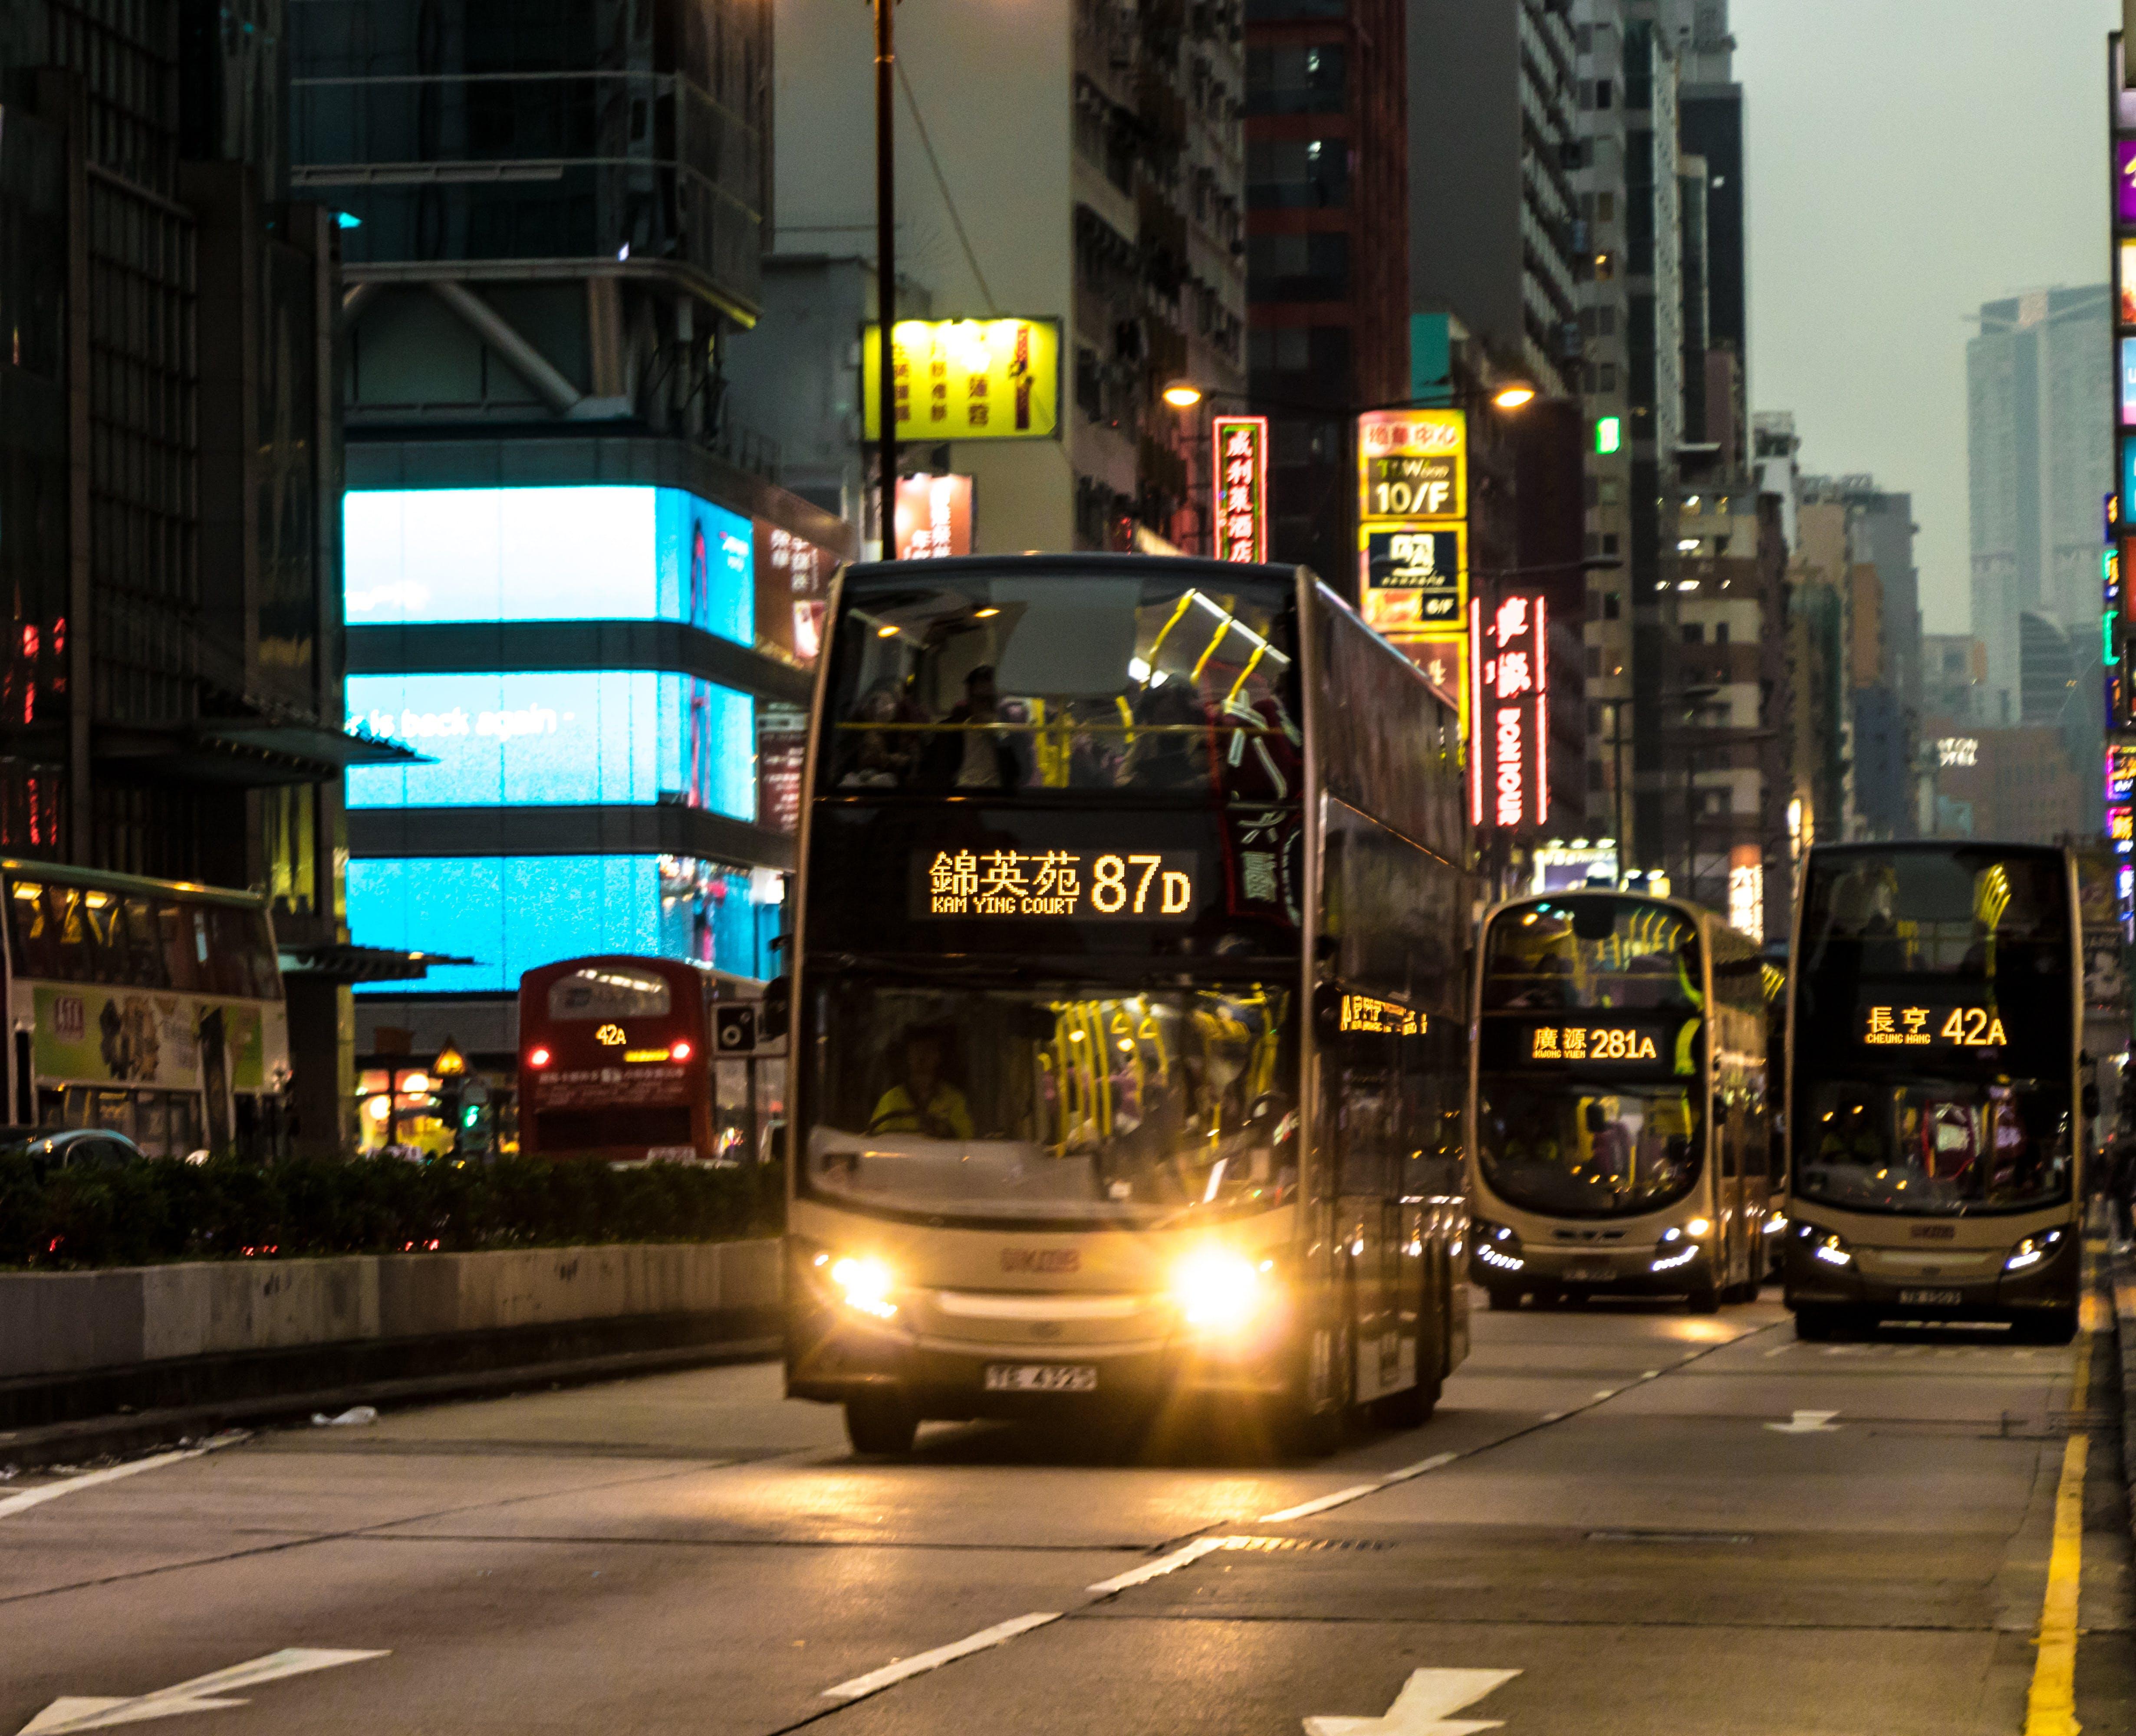 Free stock photo of bus stop, city view, hongkong, neon lights